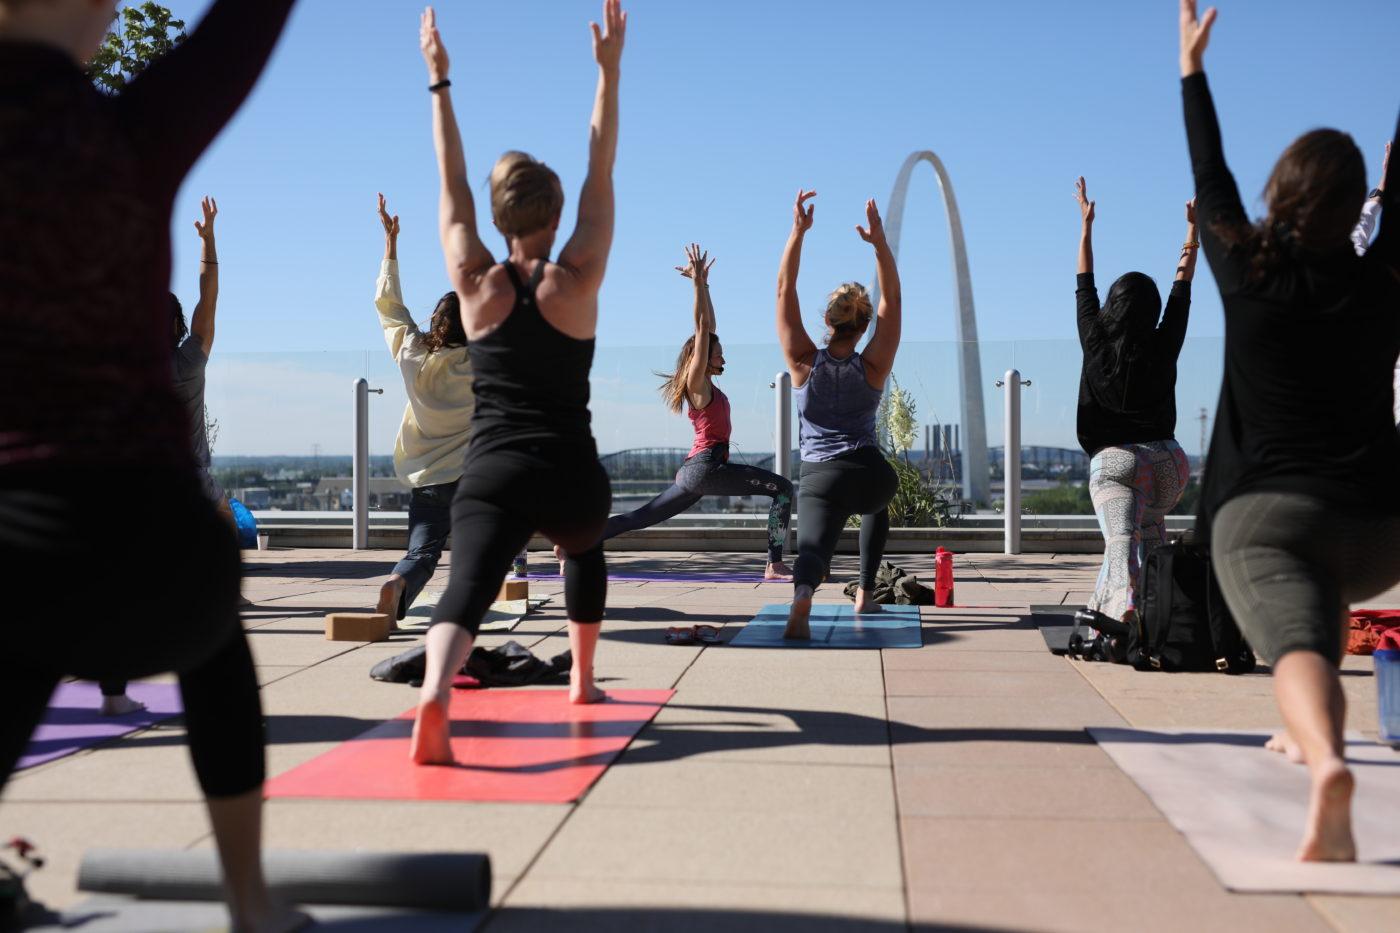 Four Seasons yoga teacher Debby Siegel offers yoga in St. Louis on weekends in Four Seasons' spa.